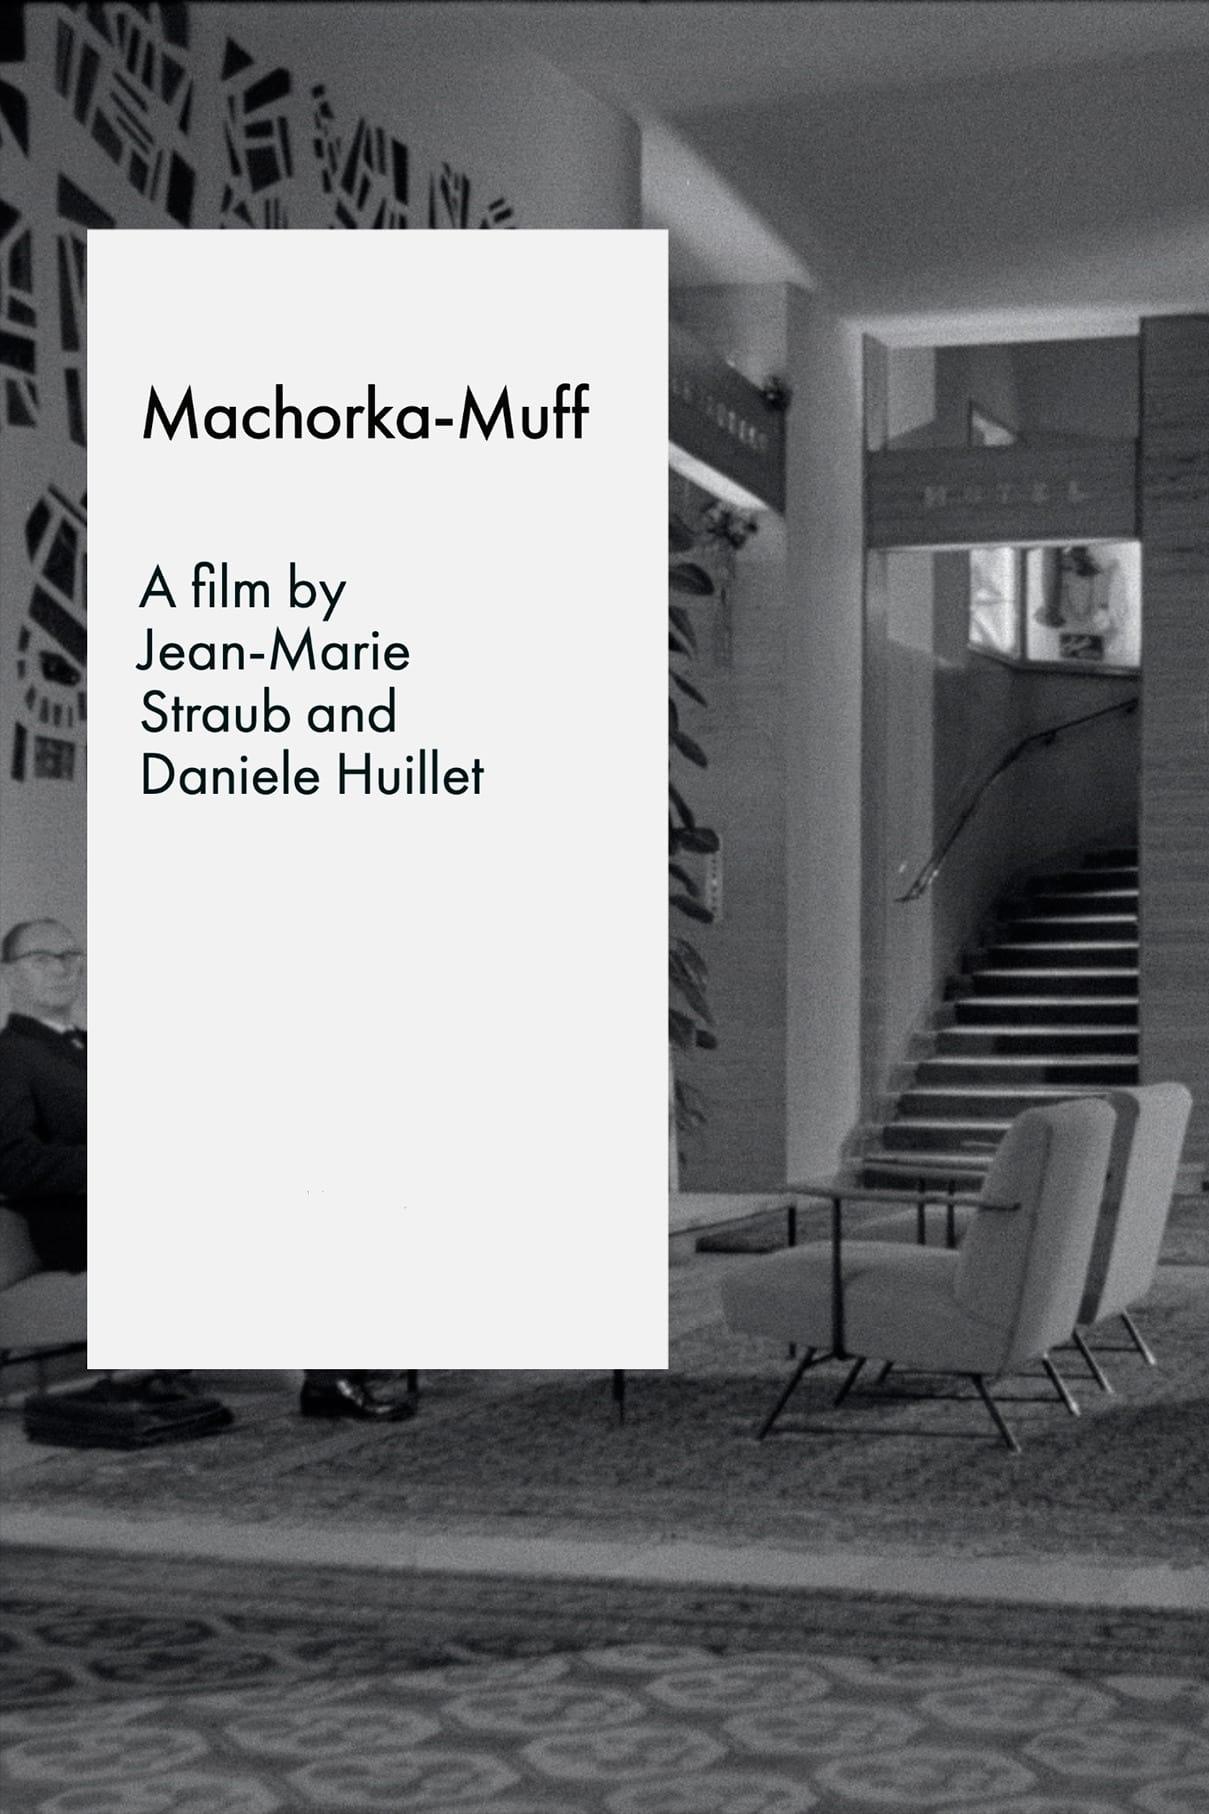 Machorka-Muff